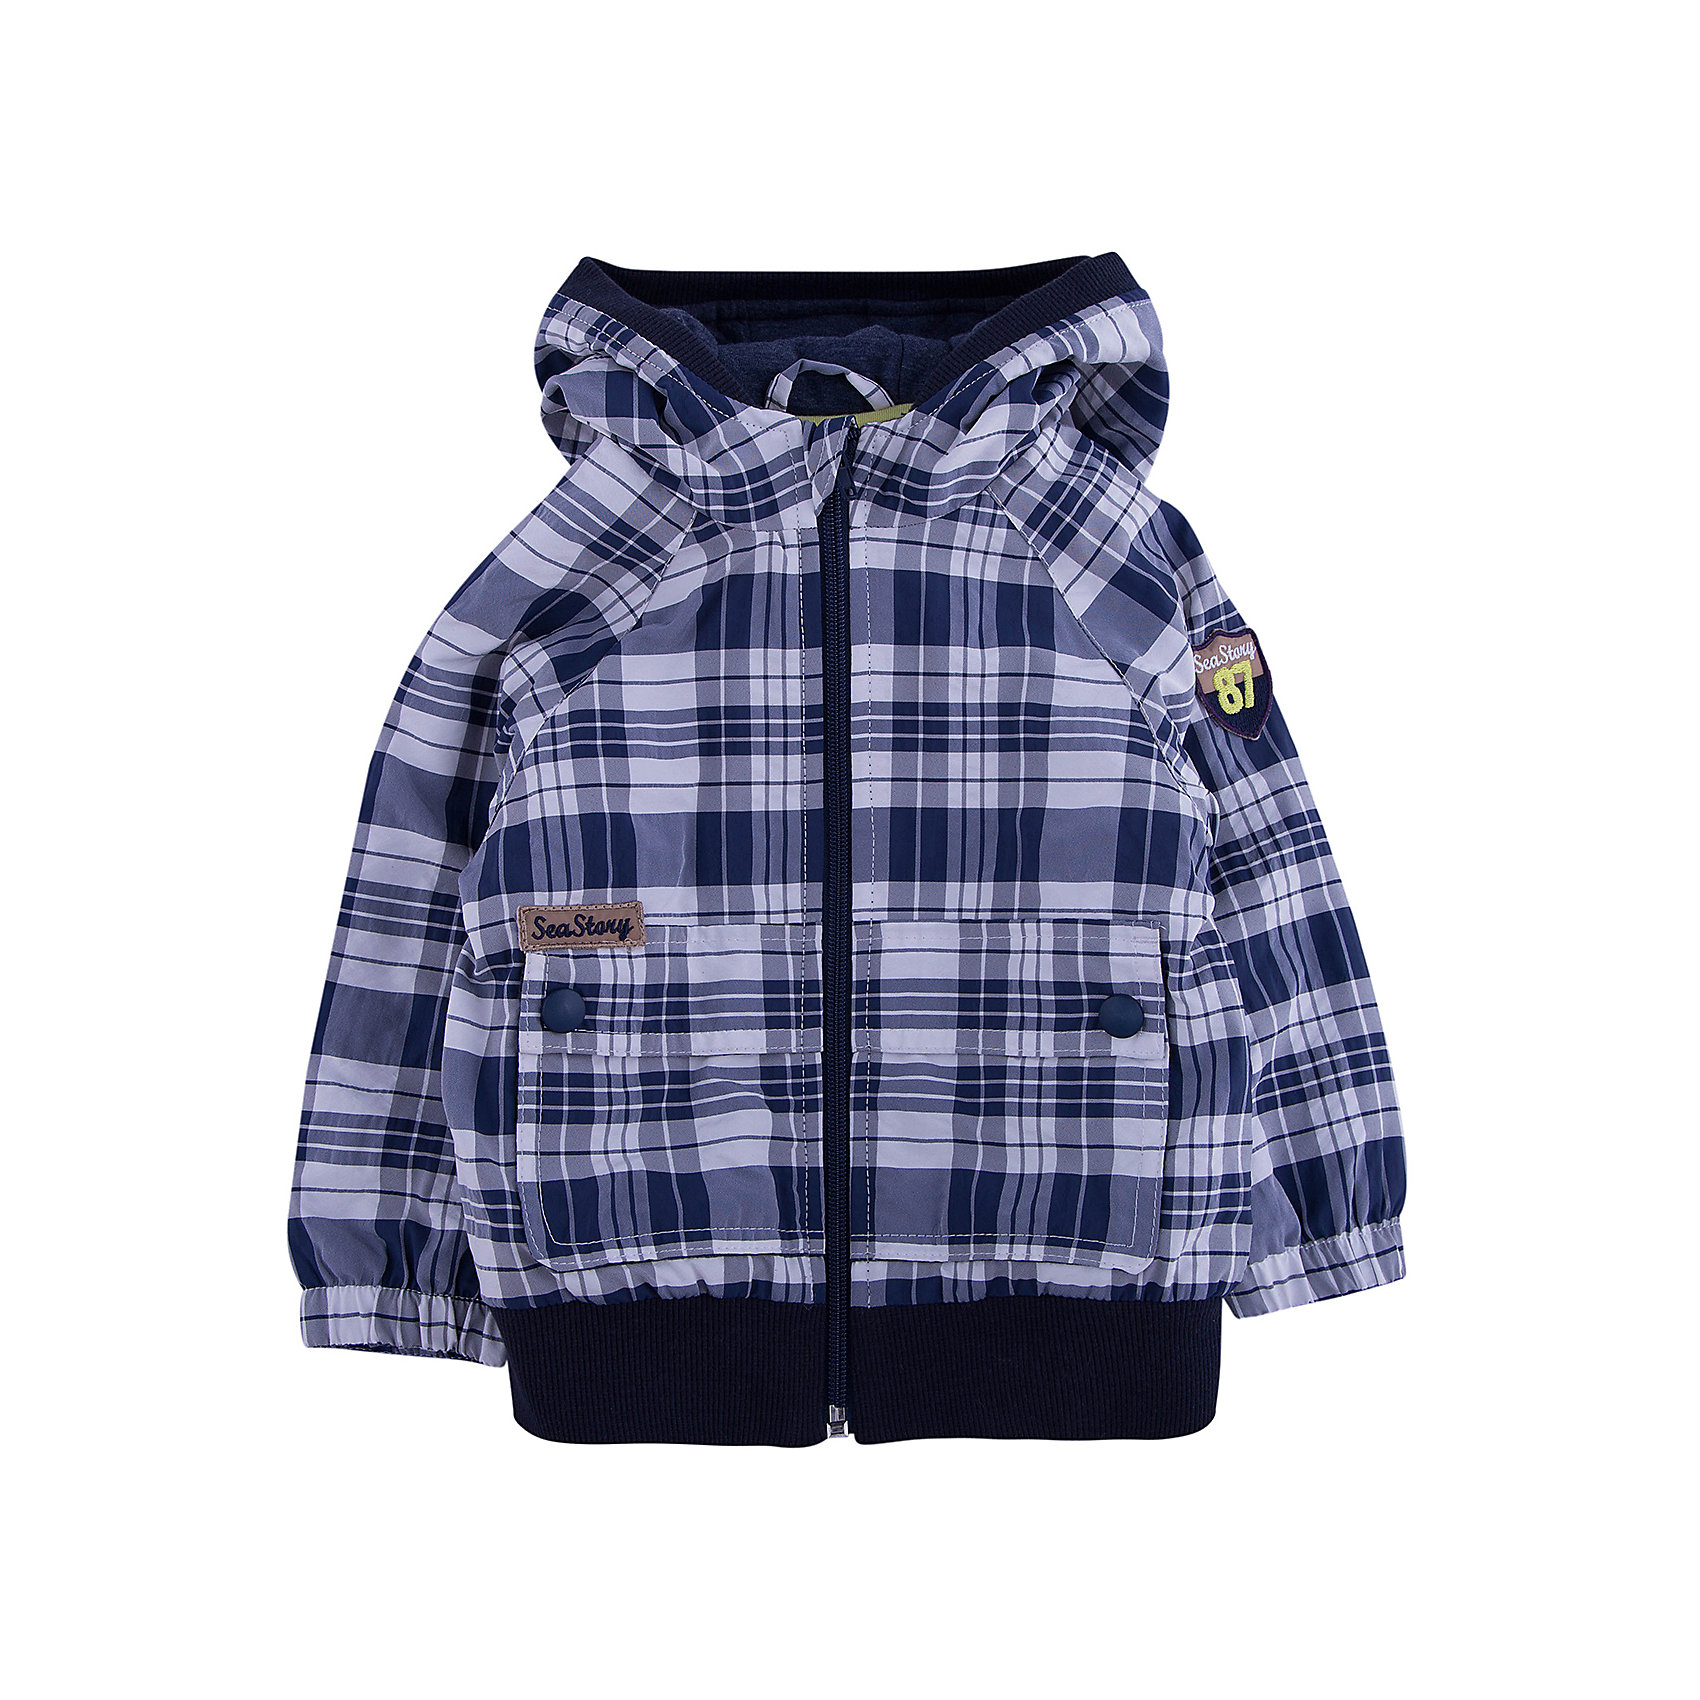 Куртка для мальчика WojcikВерхняя одежда<br>Куртка для мальчика Wojcik<br>Состав:<br>Полиэстер 51% Полиамид 49%<br><br>Ширина мм: 356<br>Глубина мм: 10<br>Высота мм: 245<br>Вес г: 519<br>Цвет: белый<br>Возраст от месяцев: 3<br>Возраст до месяцев: 6<br>Пол: Мужской<br>Возраст: Детский<br>Размер: 68,92,74<br>SKU: 5588678